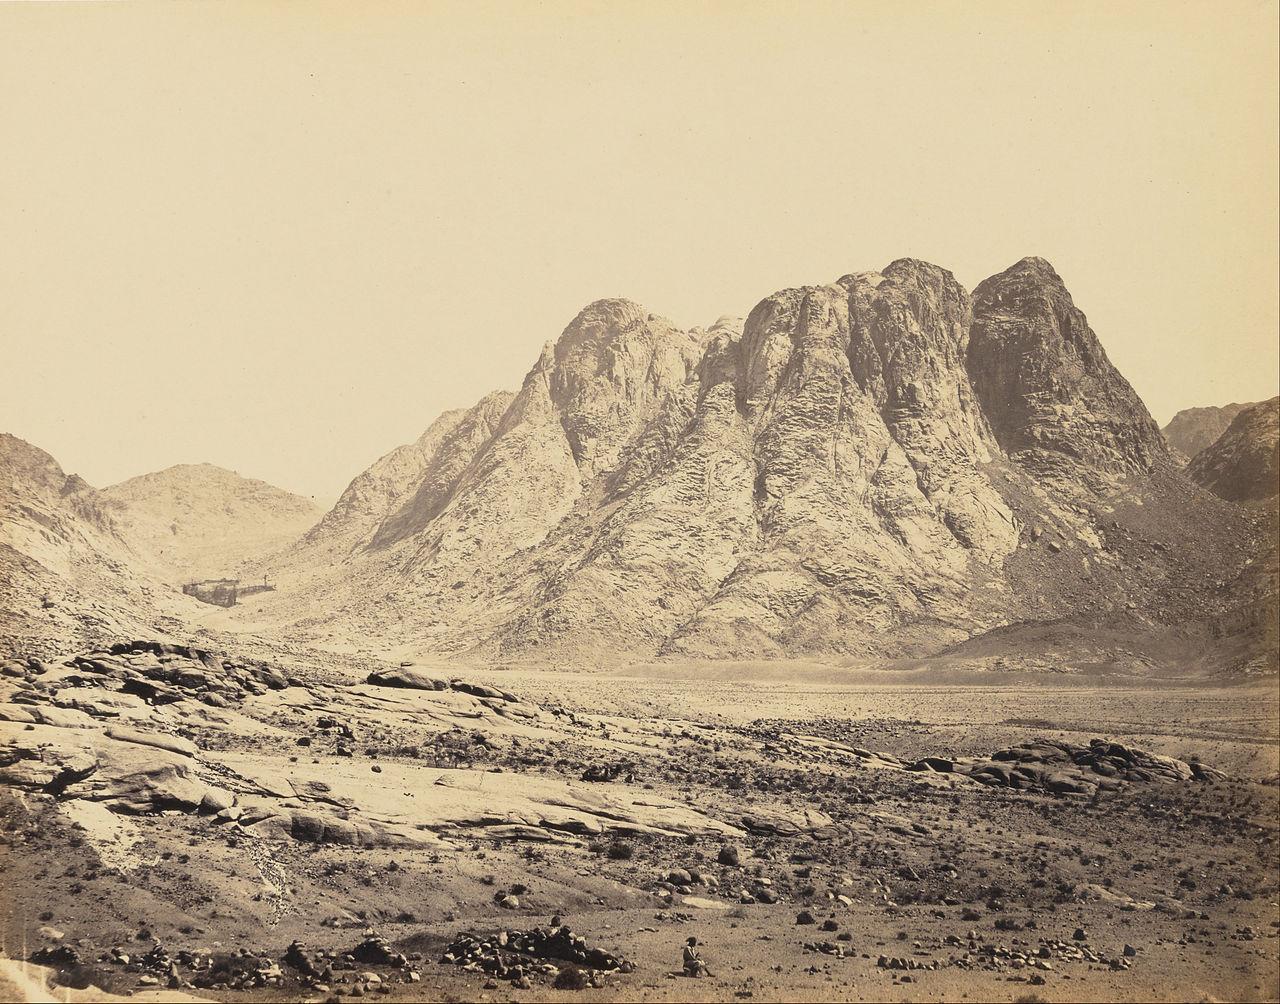 mount horeb buddhist dating site Mount horeb, hebrew חֹרֵב,  buddhism tibetan buddhism  at 1 kings 19:8, elijah visits horeb the mount of god.